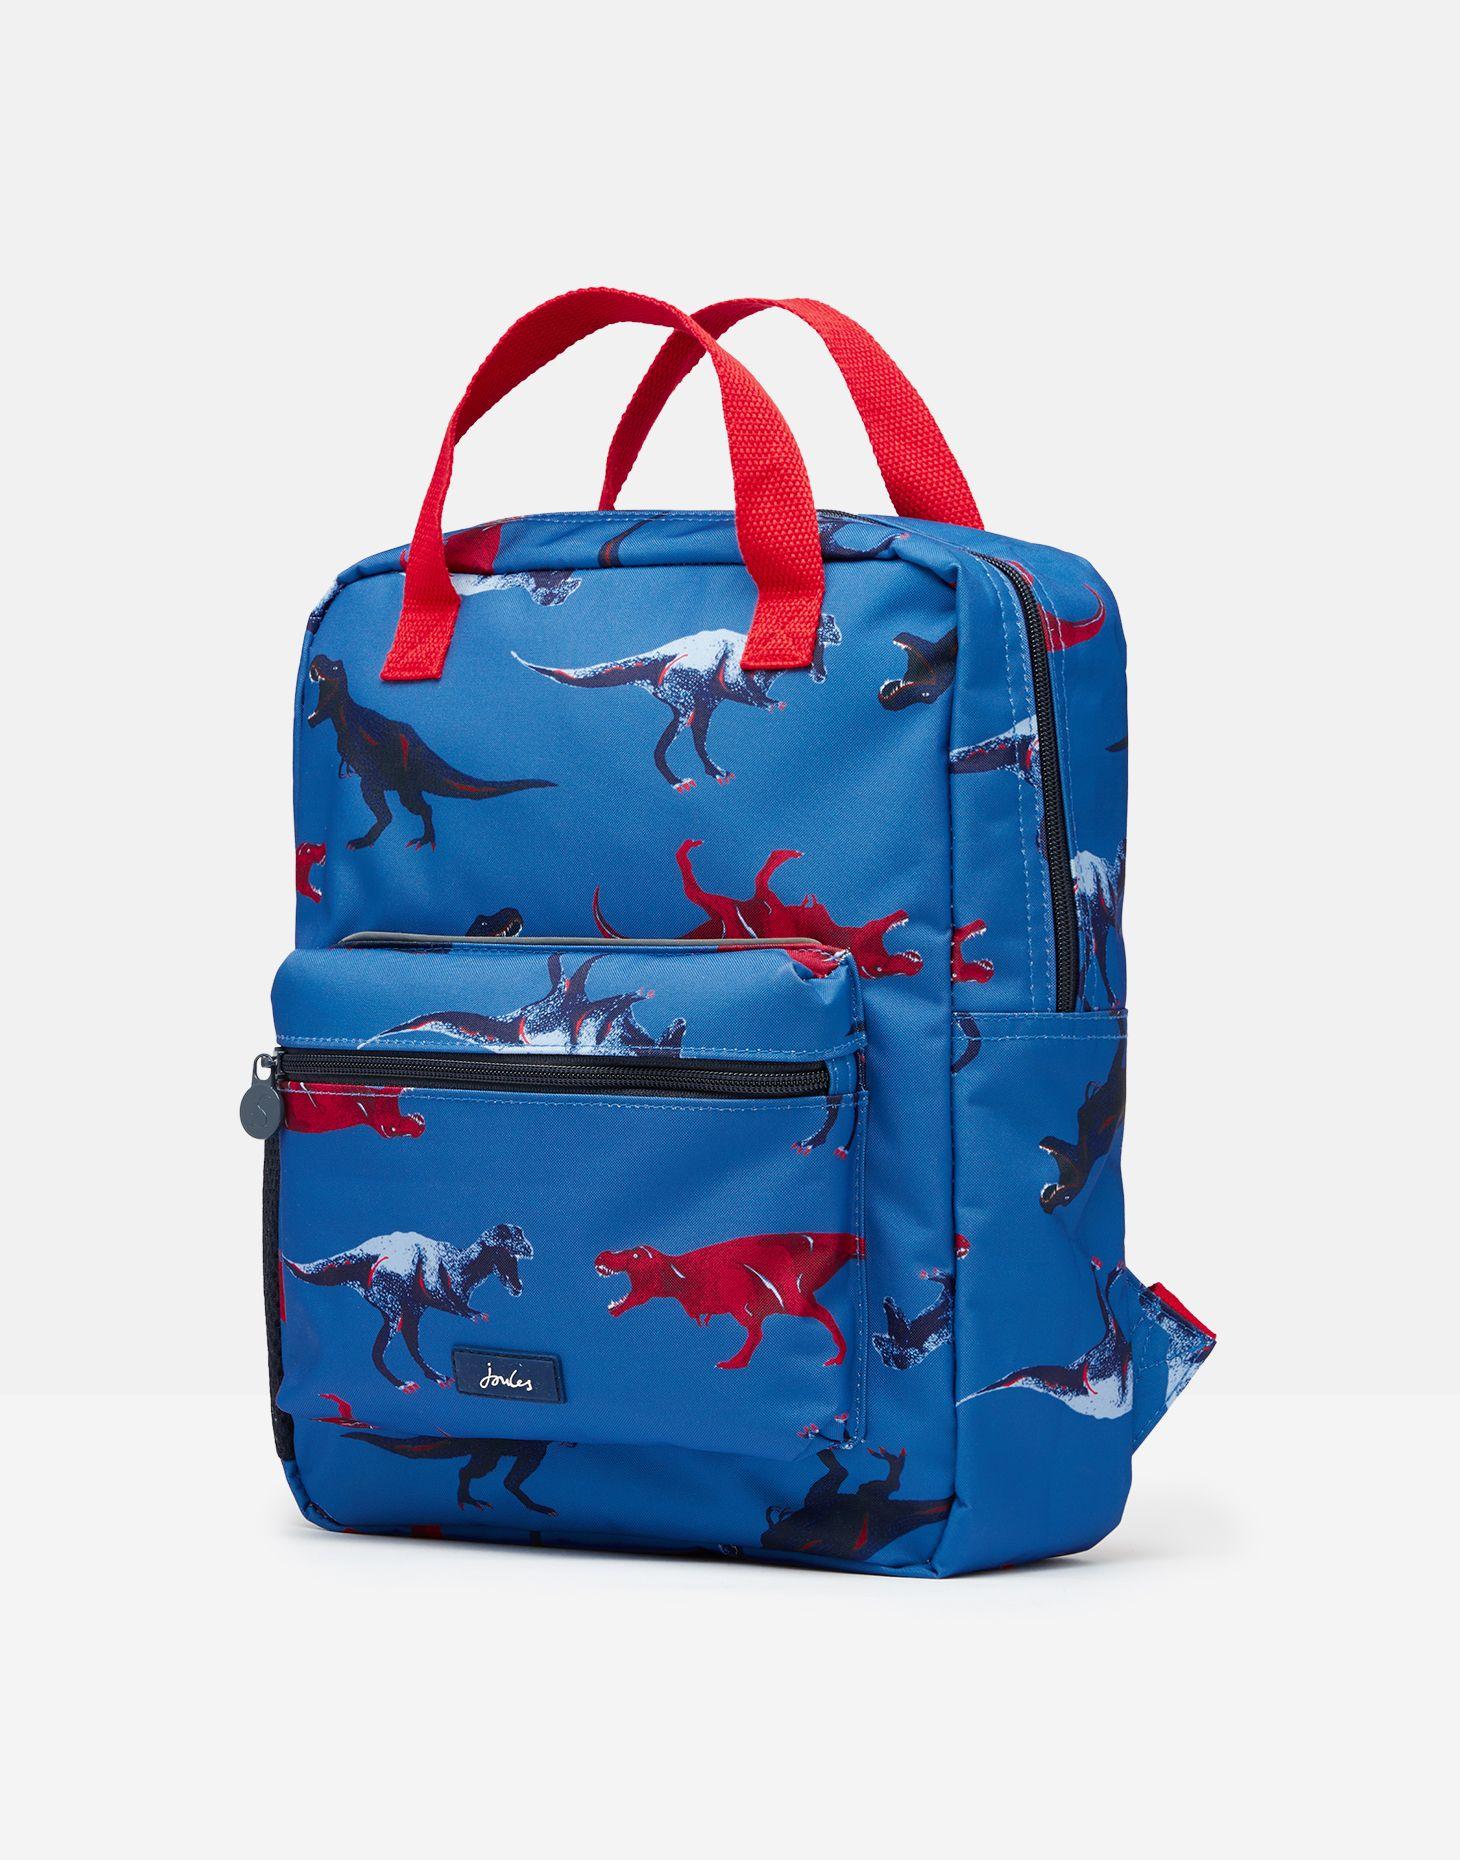 Joules Boys Easton Printed Backpack BLUE DINOSAUR